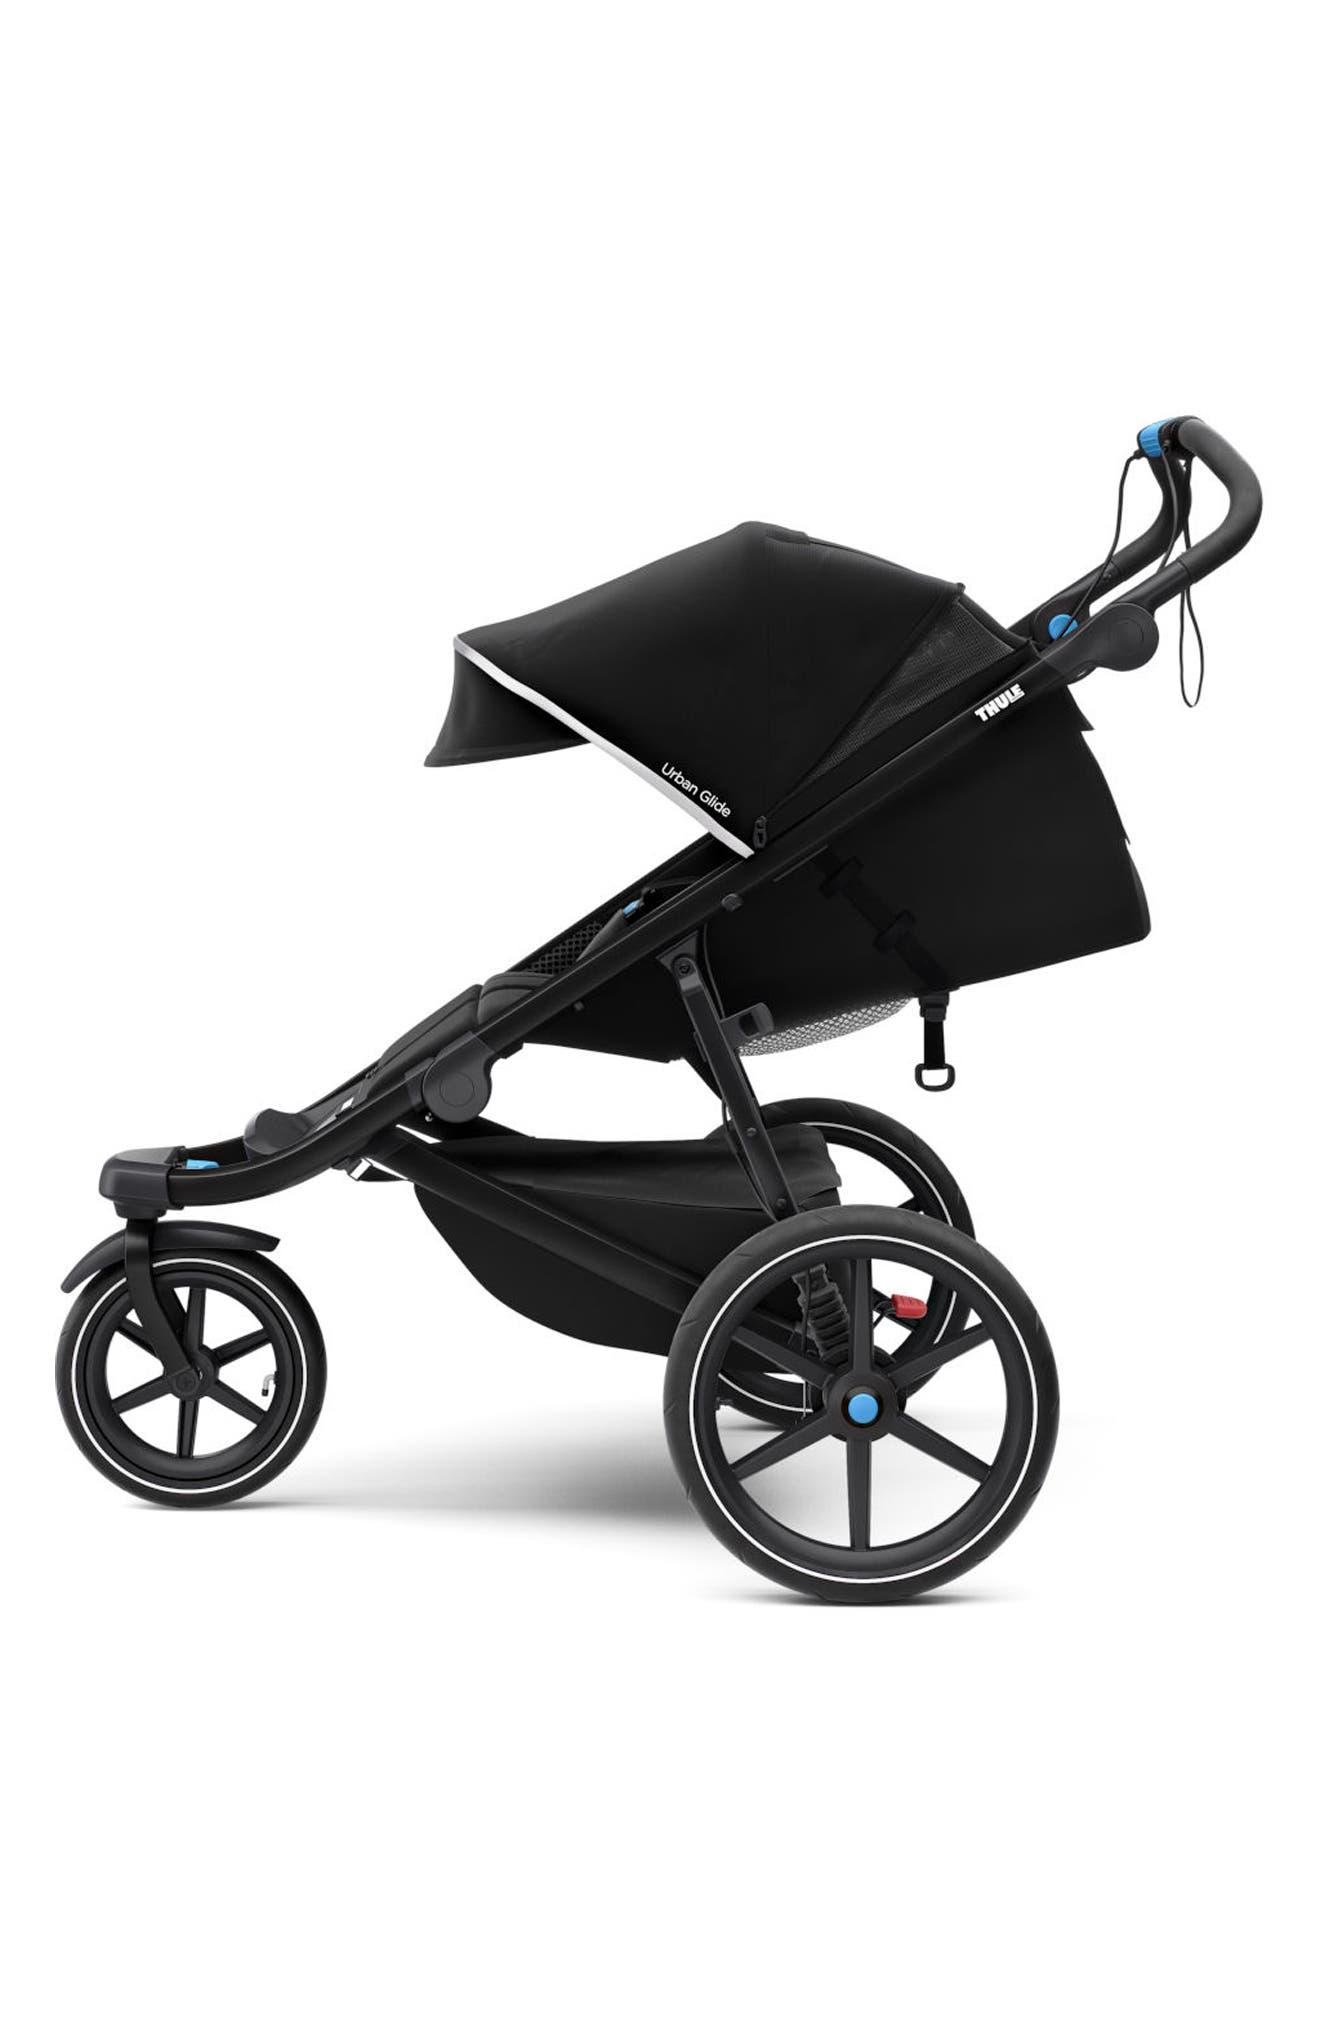 THULE,                             Urban Glide 2 Jogging Stroller with Black Frame,                             Alternate thumbnail 2, color,                             006